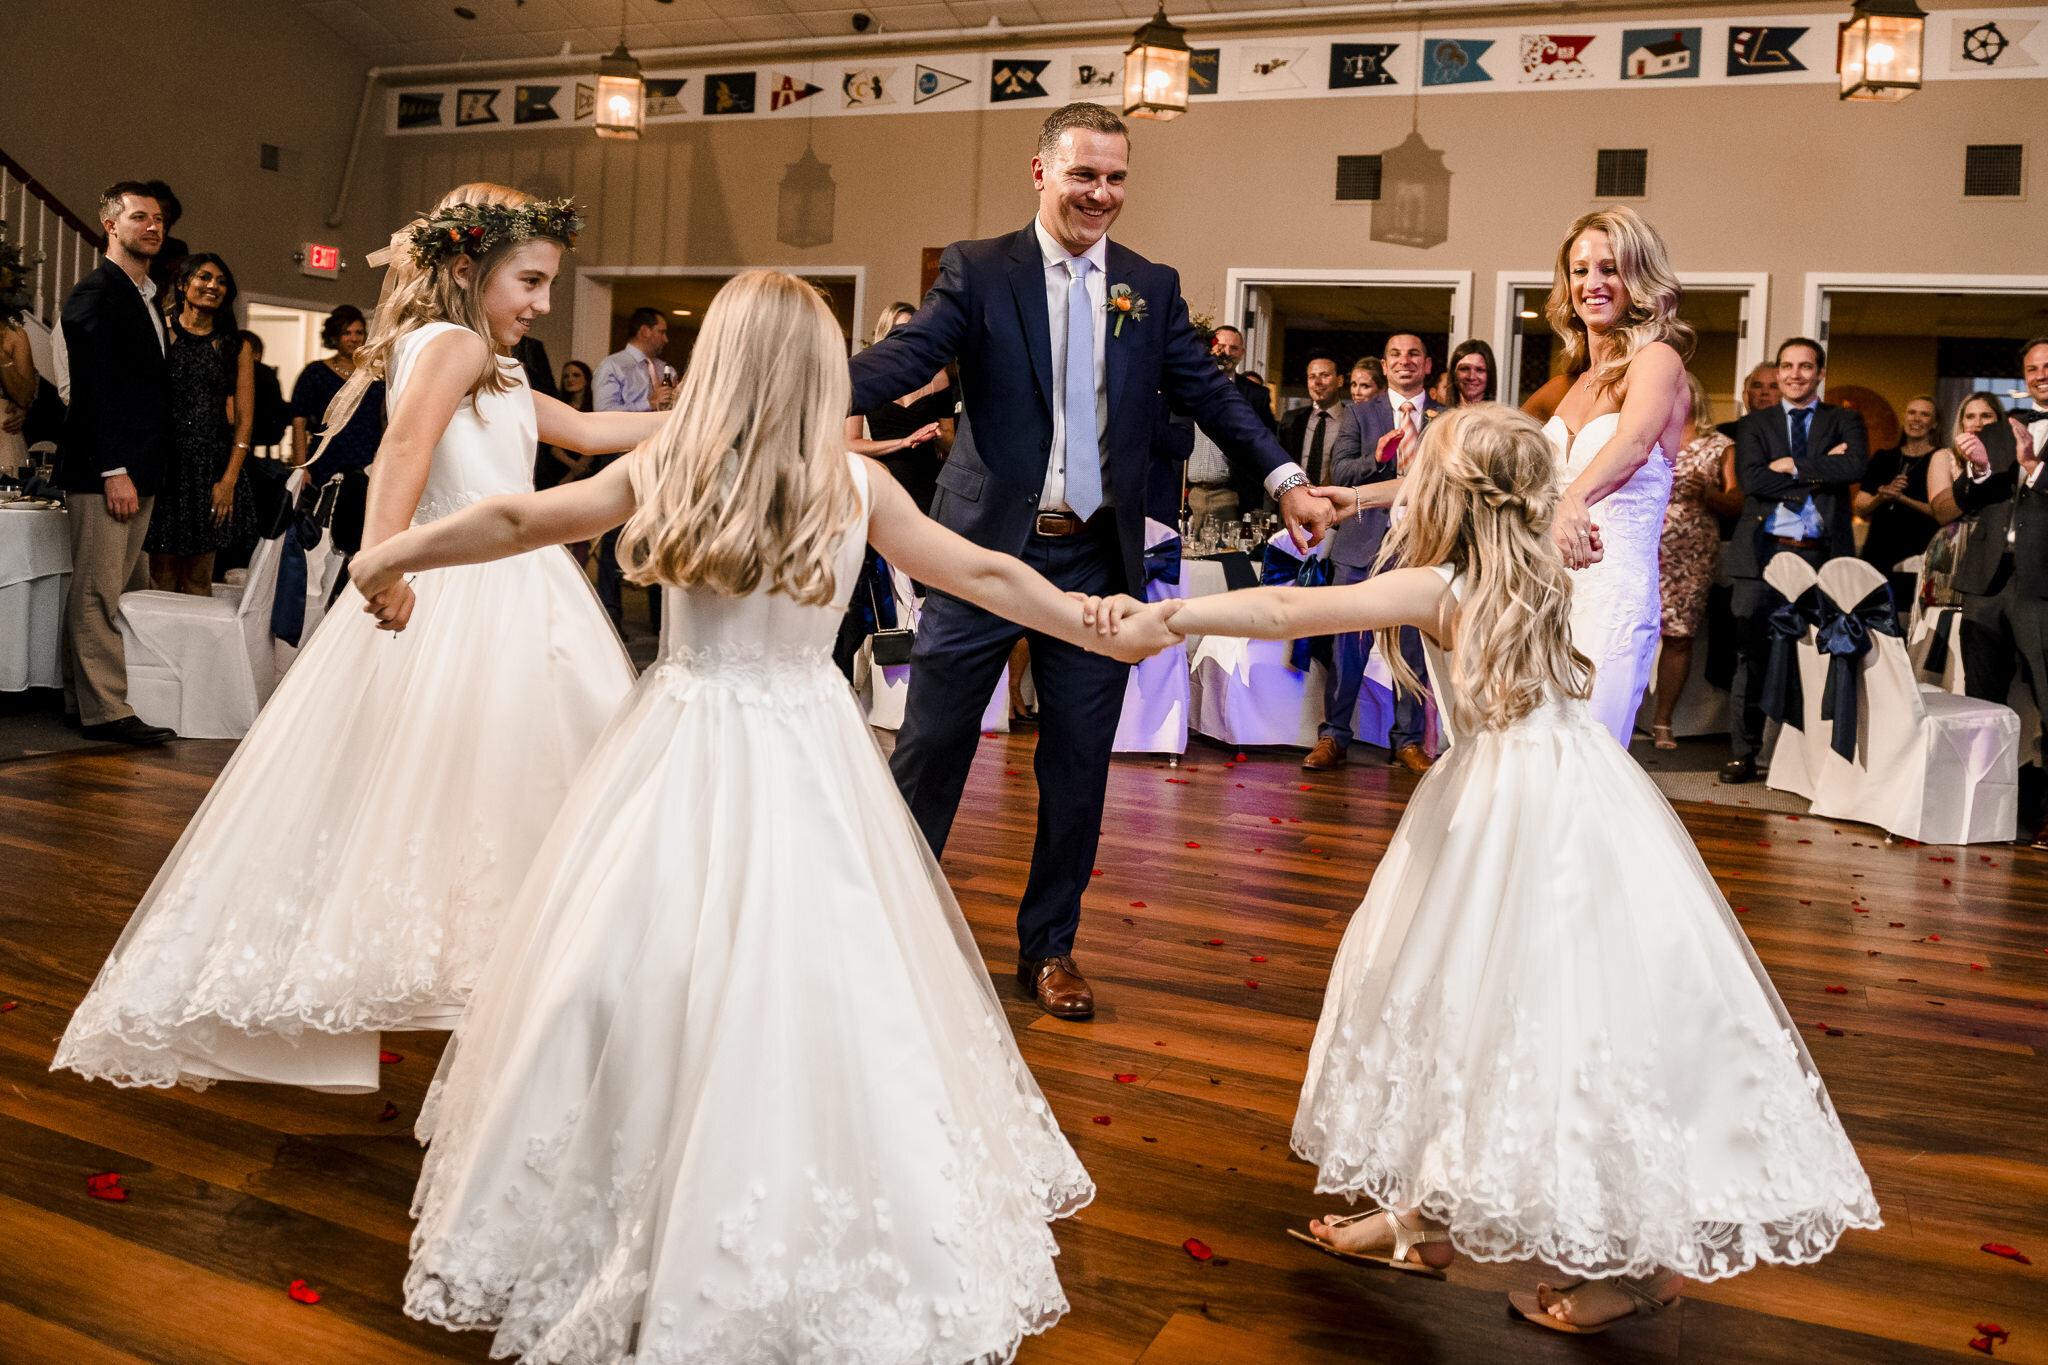 Snell-Ocean-City-Yacht-Club-New-Jersey-Wedding-Photographer-28.JPG